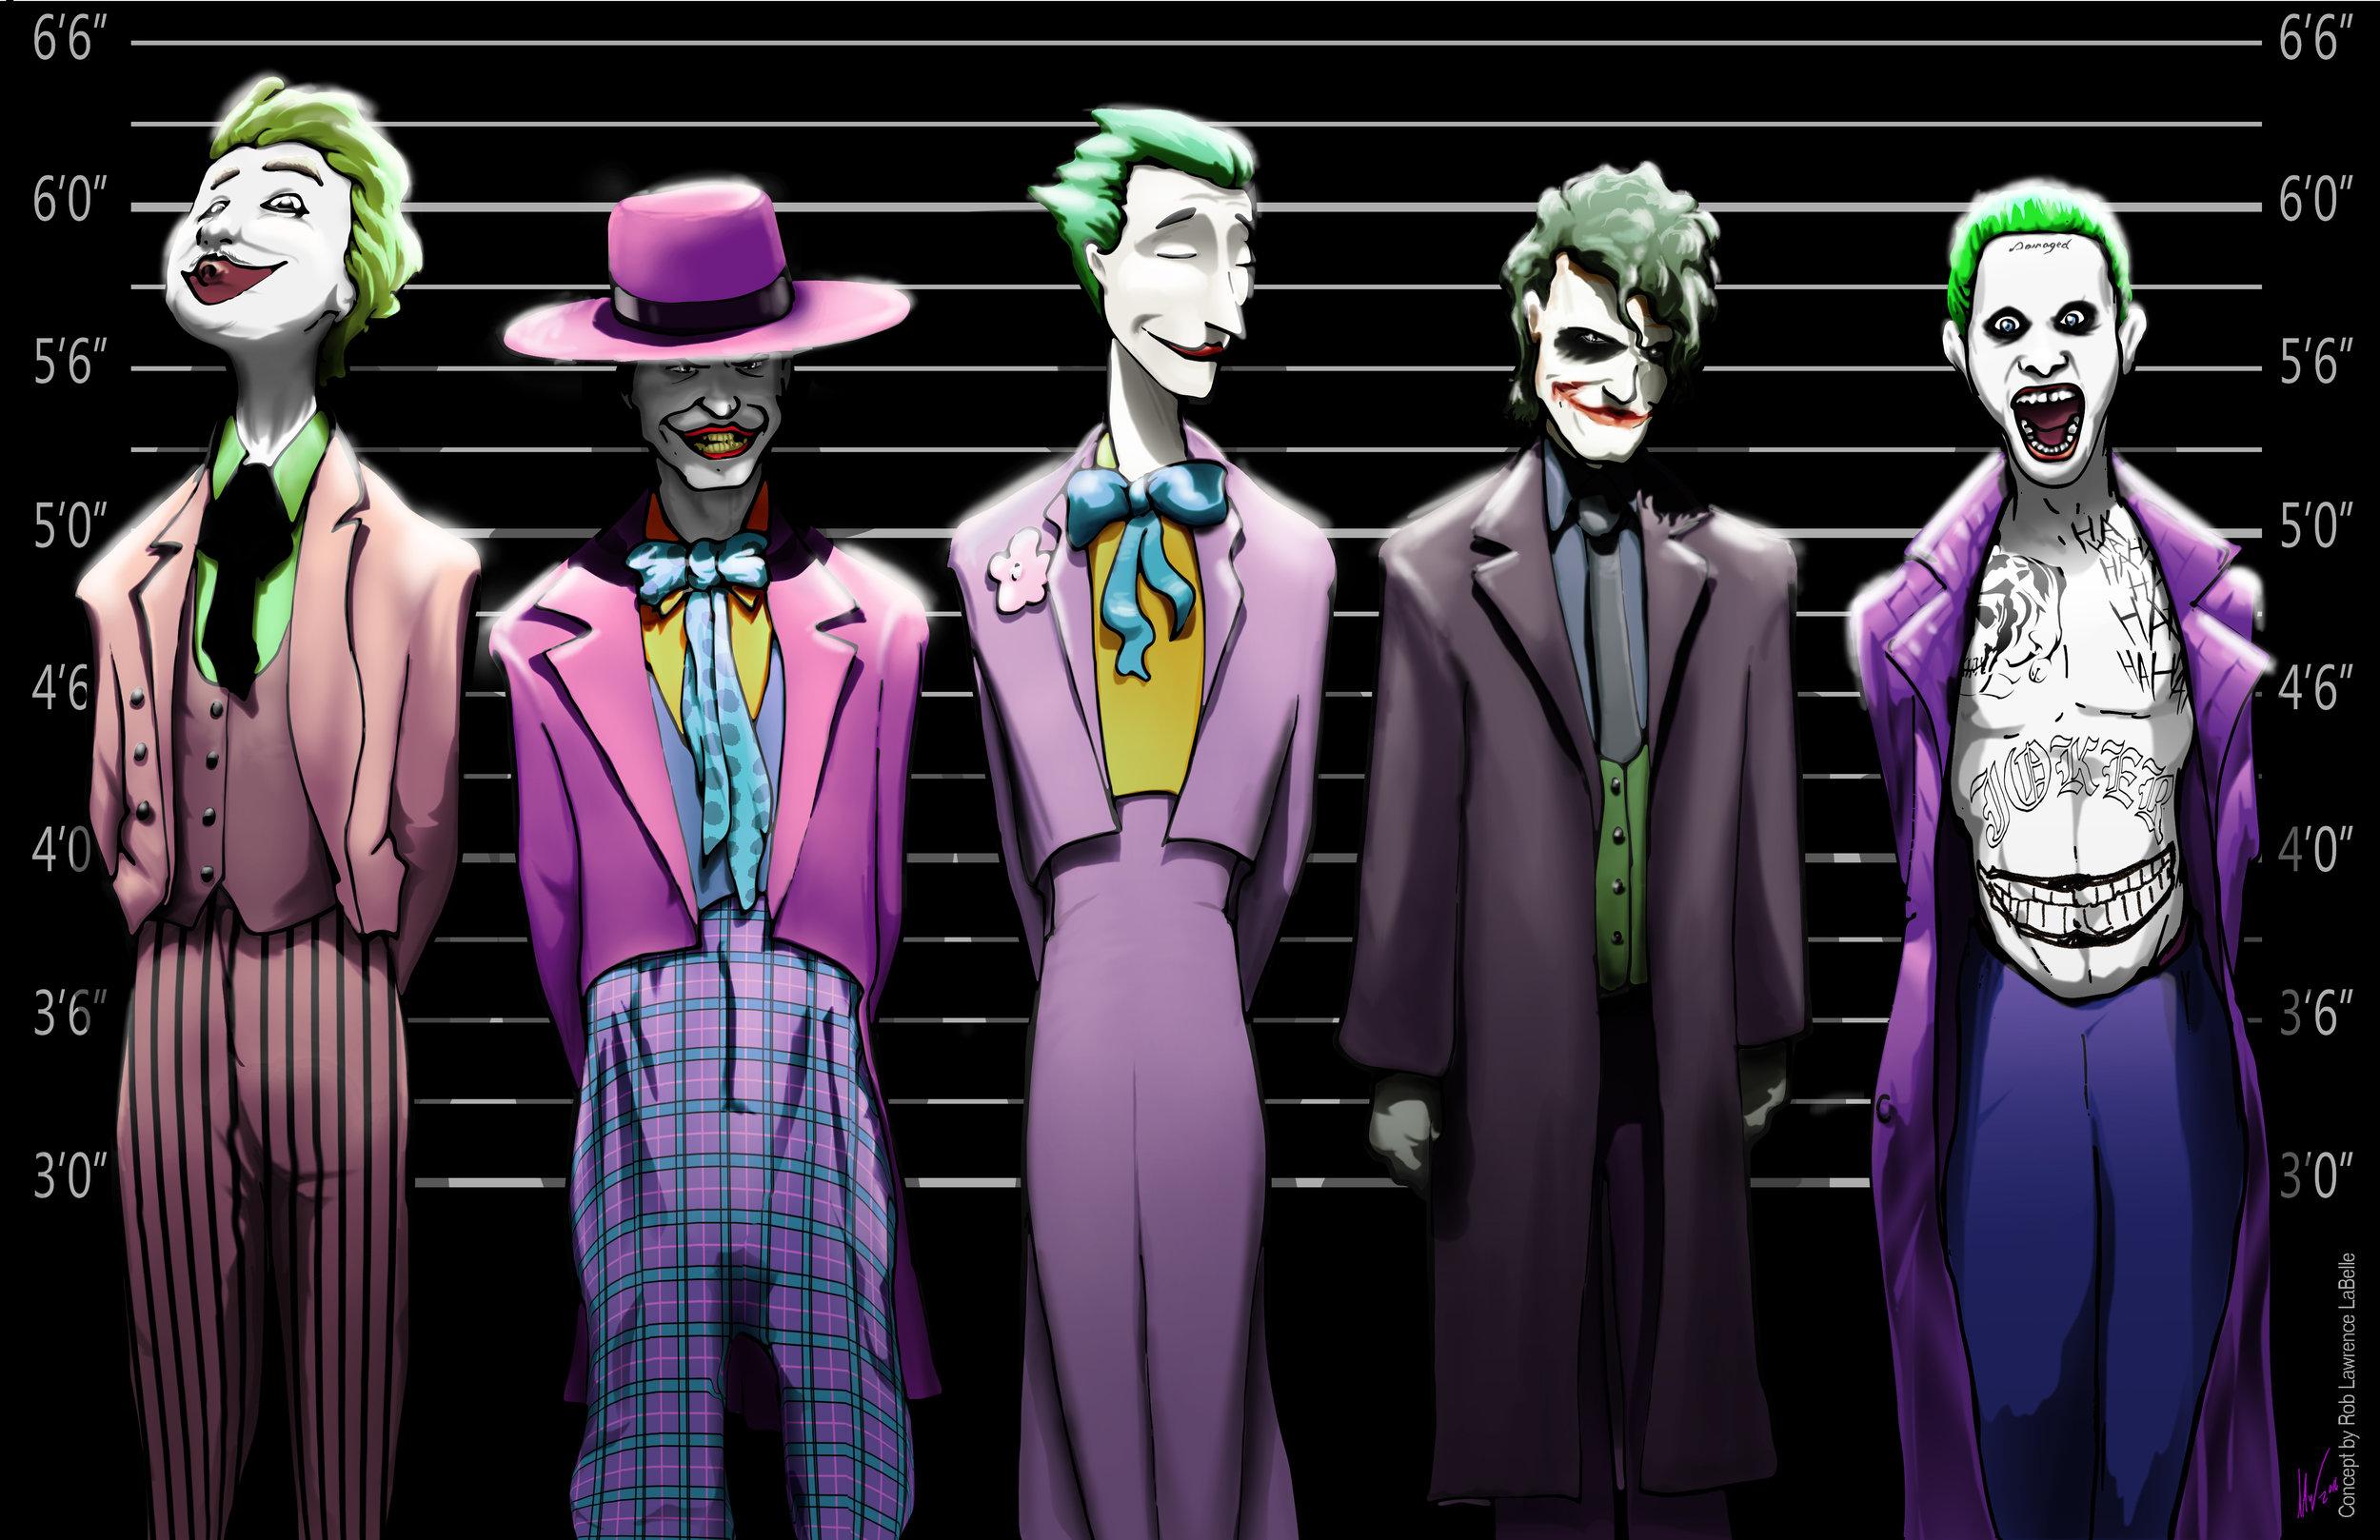 Joker-Line Up 2016 11x17.jpg